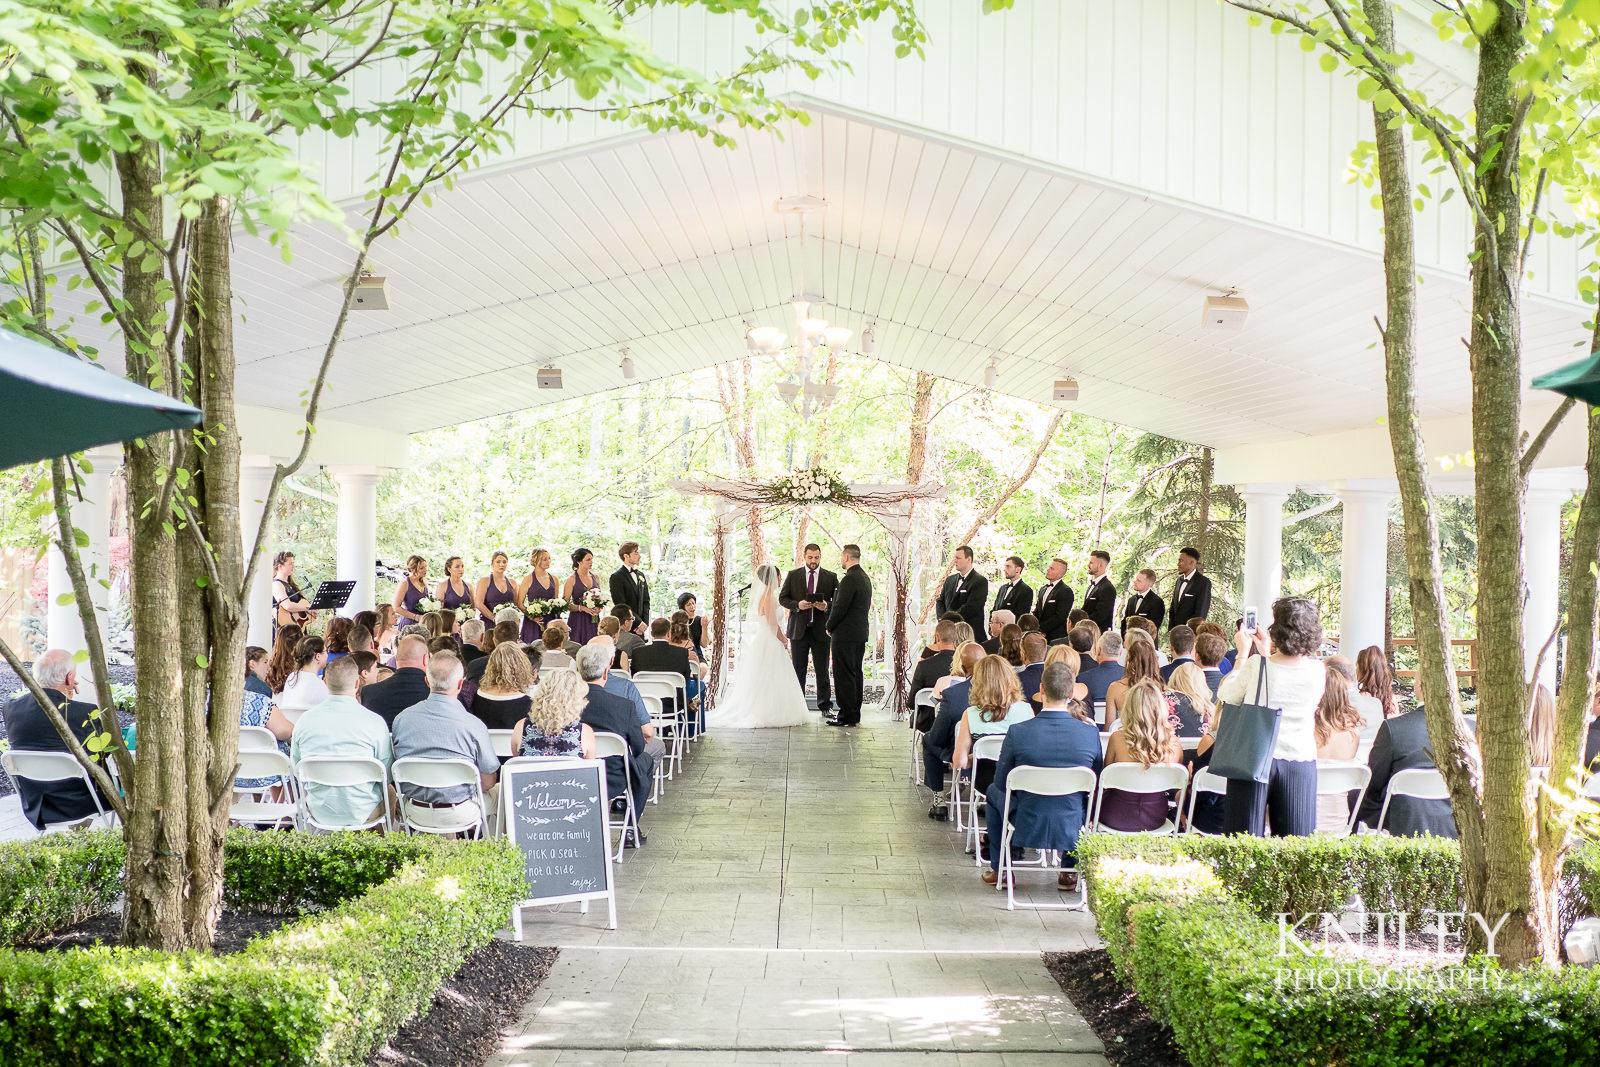 074 - Klocs Grove Buffalo NY Wedding Pictures -XT2A8269.jpg